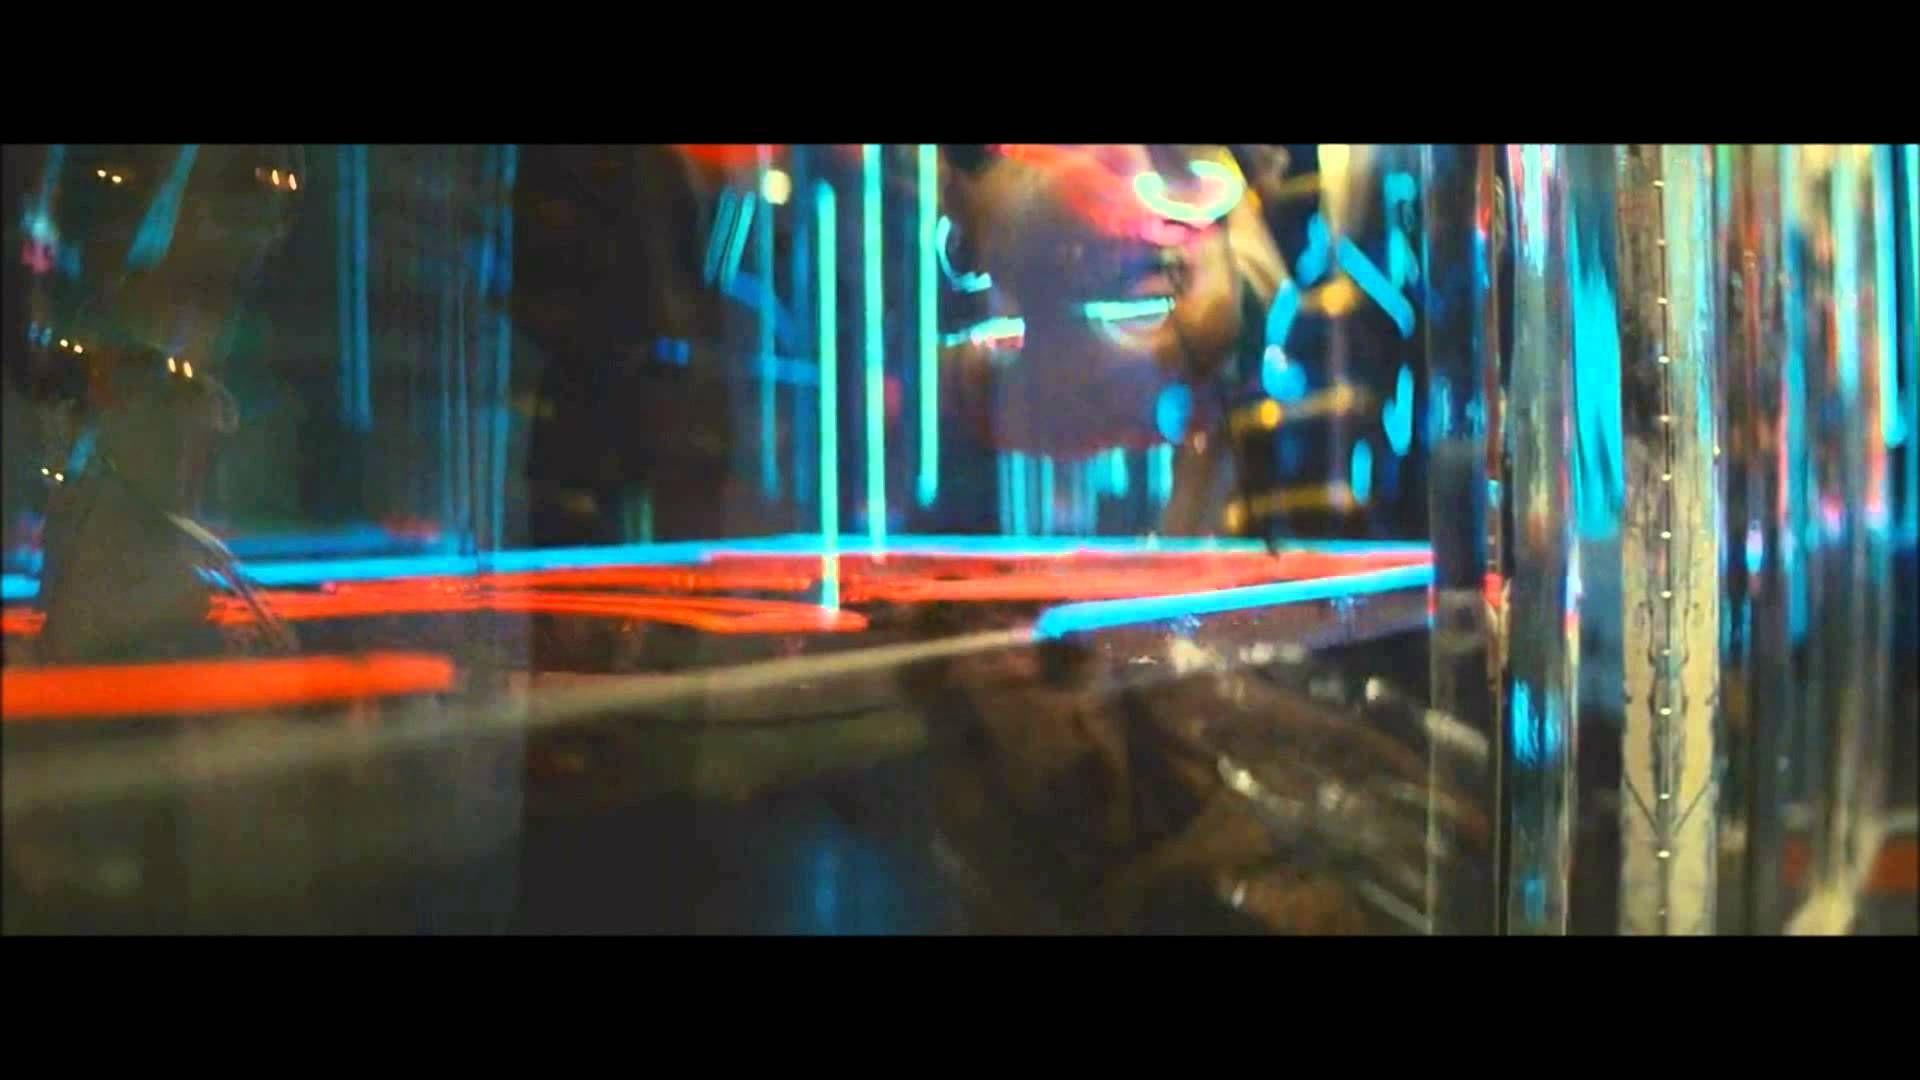 Blade Runner Tribute Electric Dreams Blade Runner Ridley Scott Blade Runner Blade